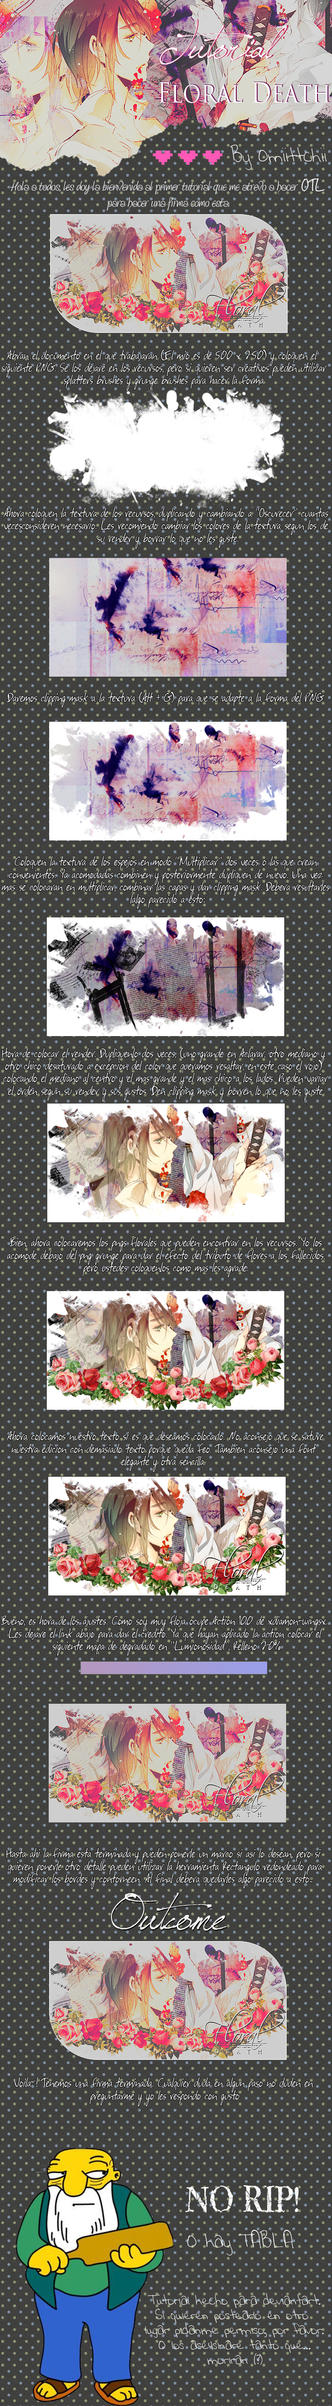 Tutorial - Floral Death by Omiittchii